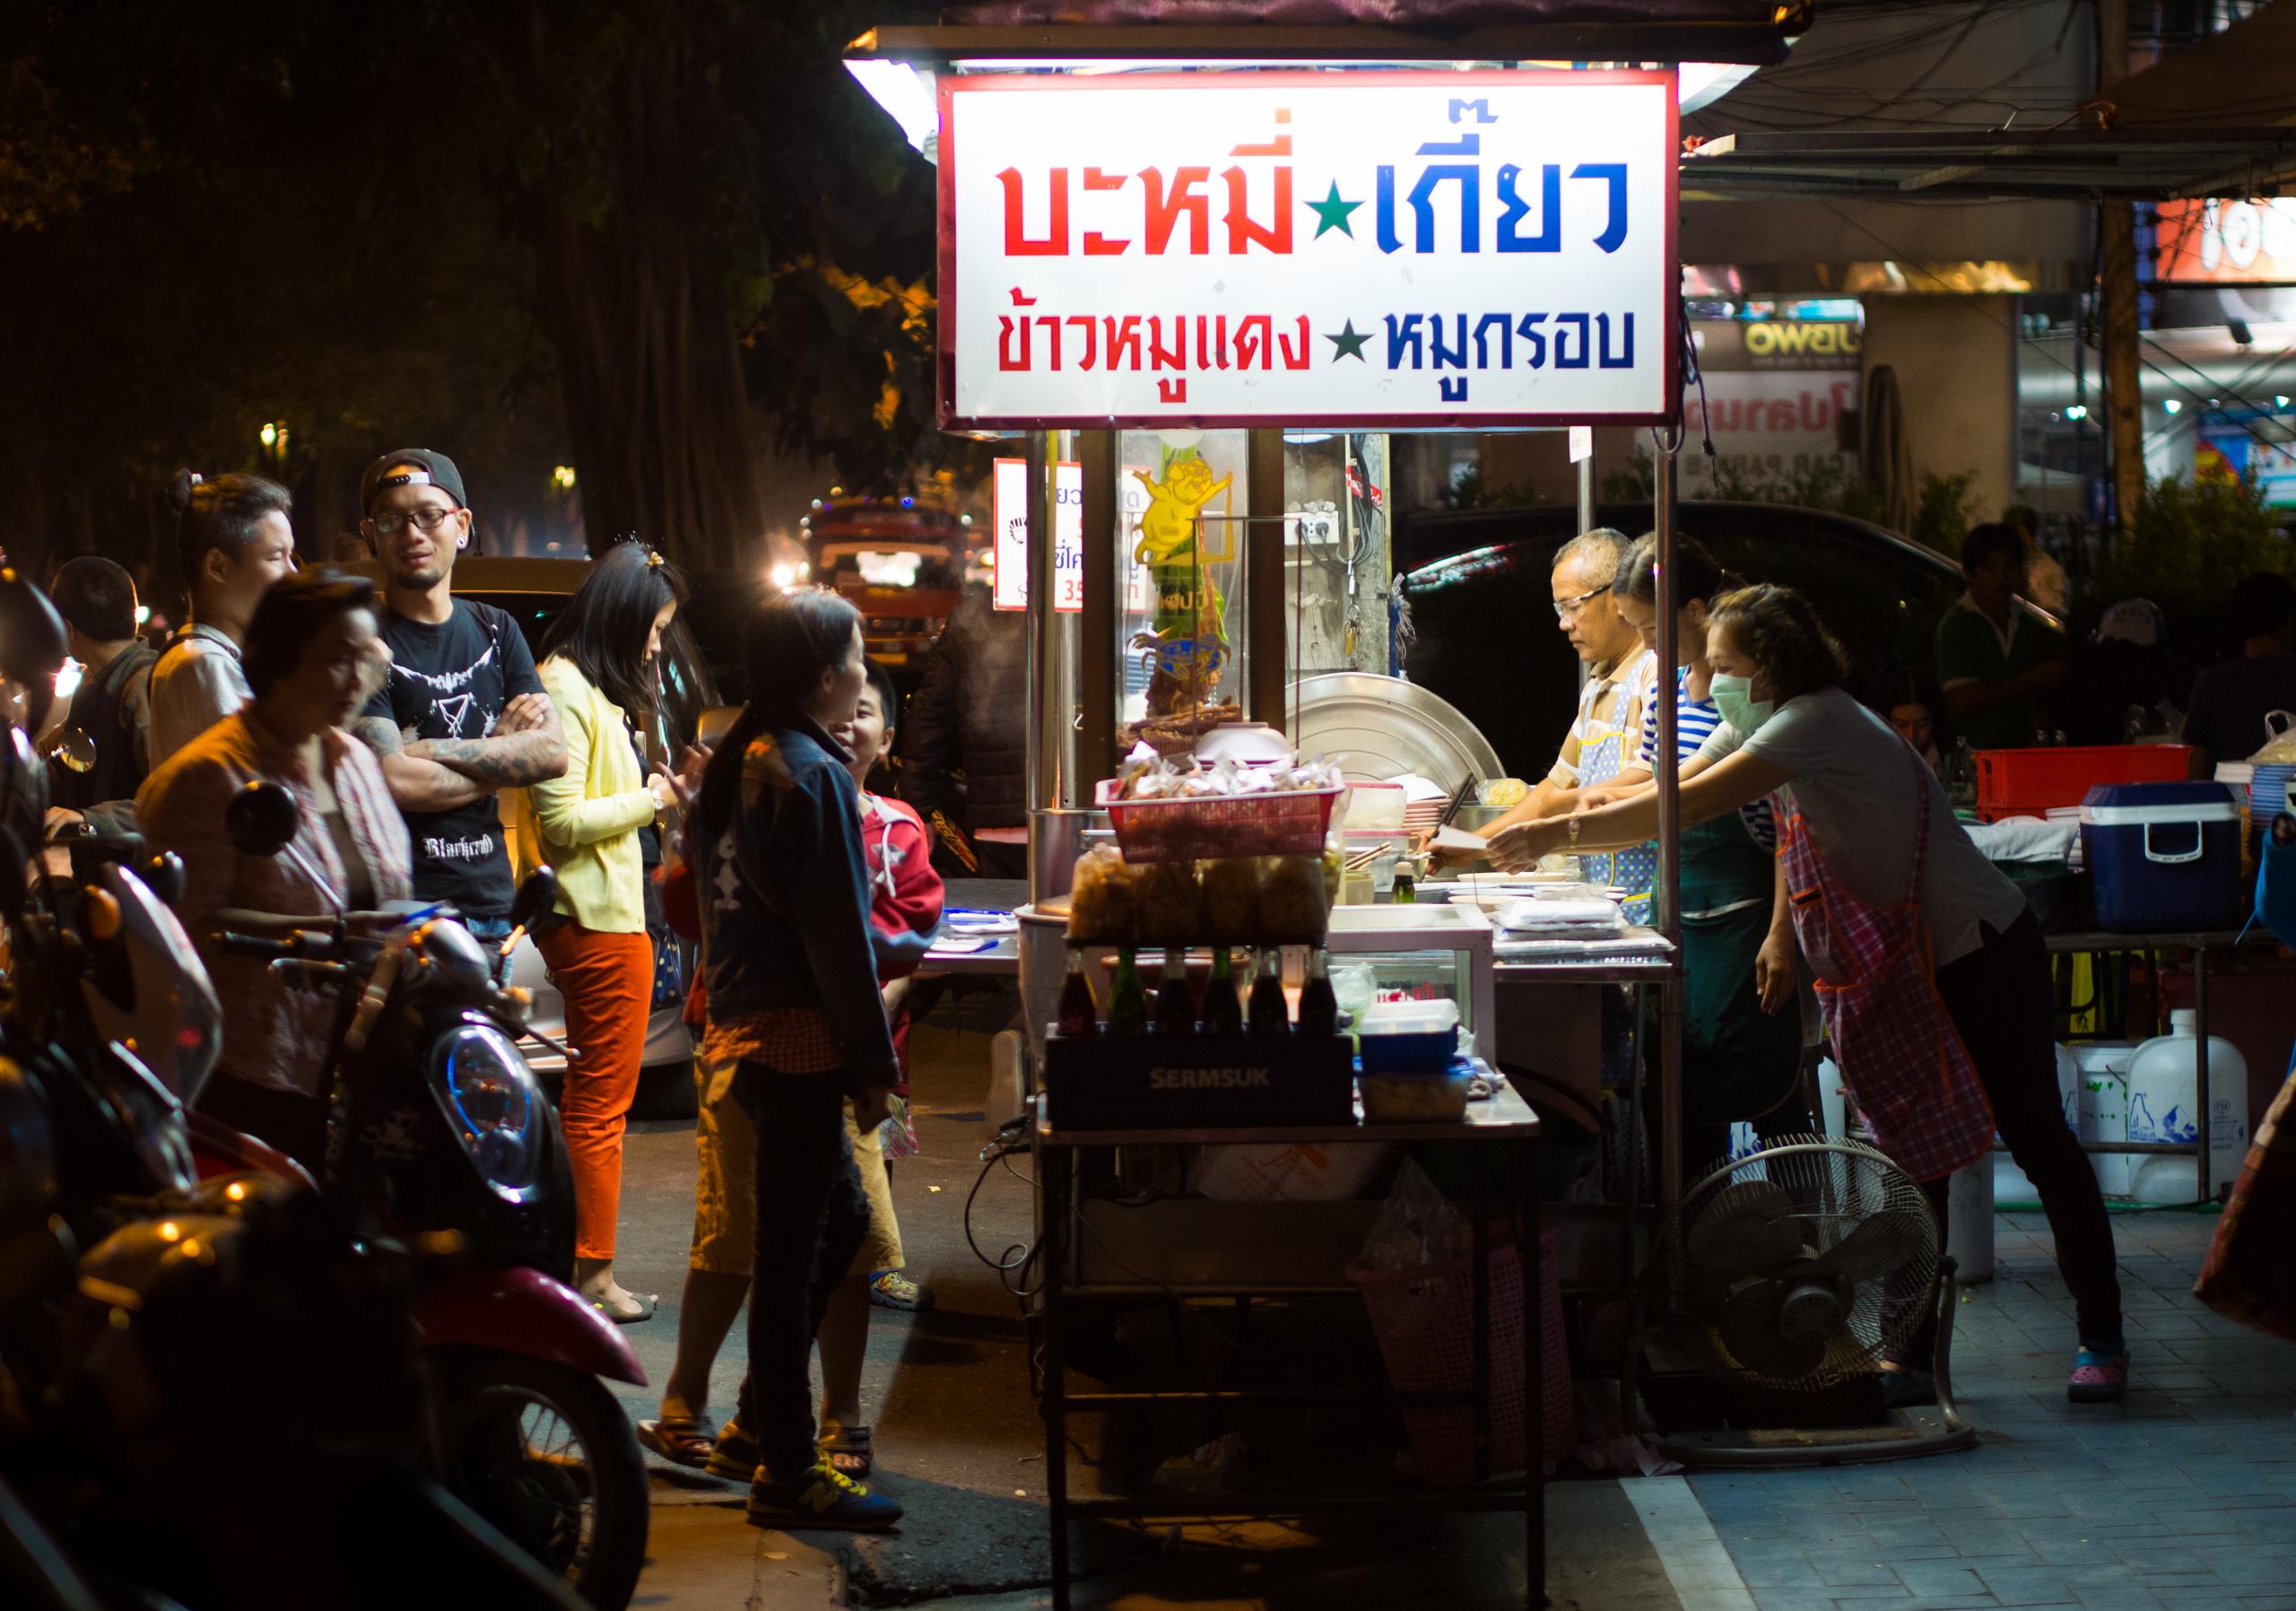 chiang may thailand shopping thai food meetngreetme